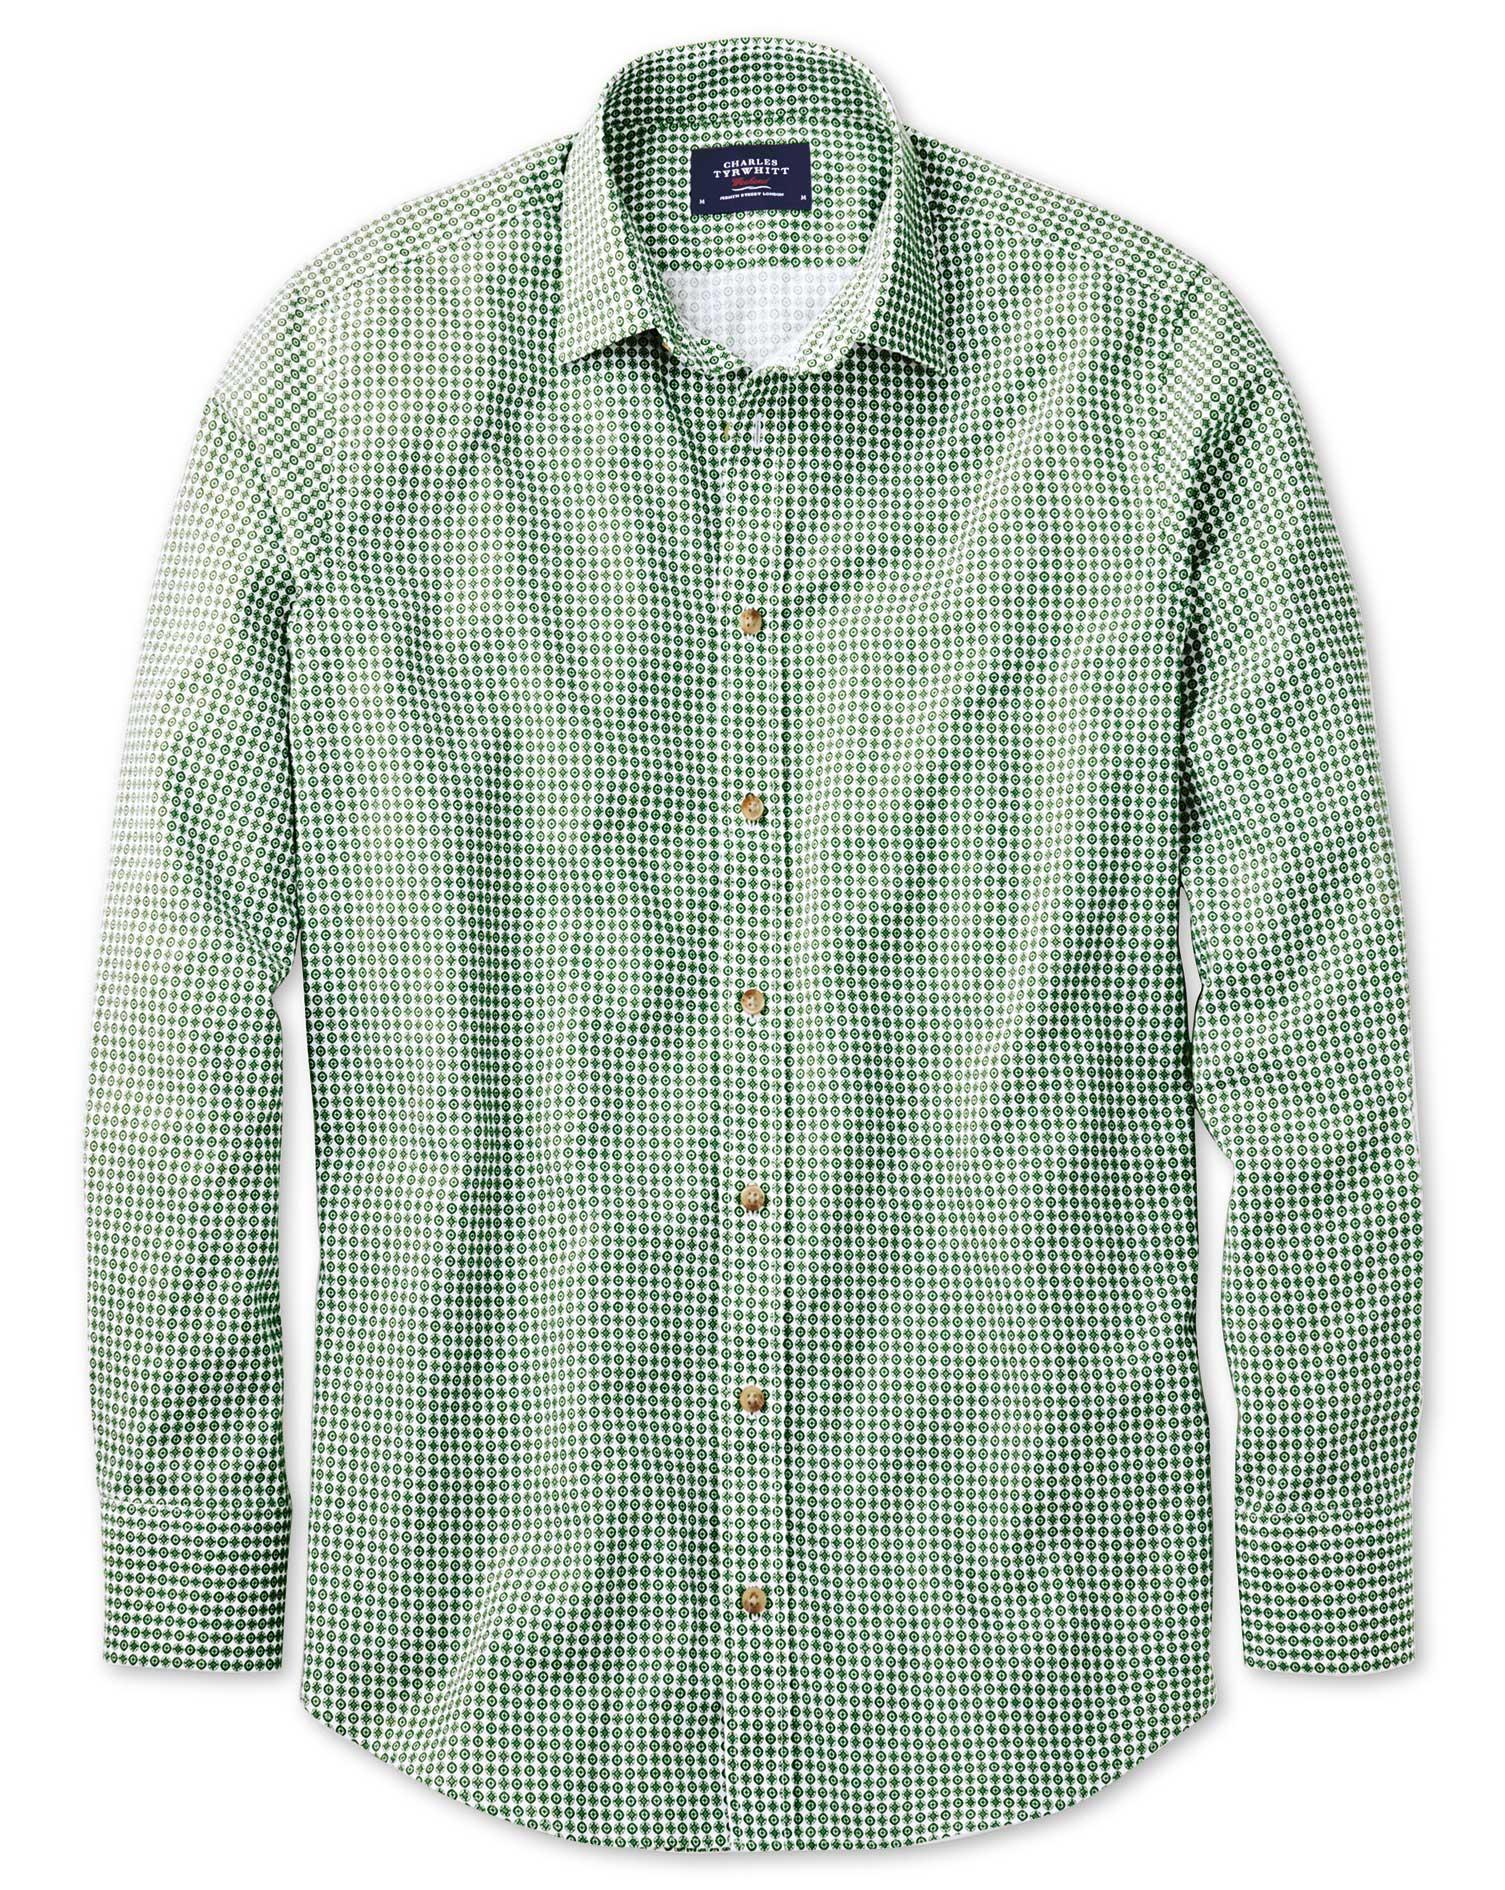 Classic Fit Green Geometric Print Shirt Single Cuff Size Large by Charles Tyrwhitt